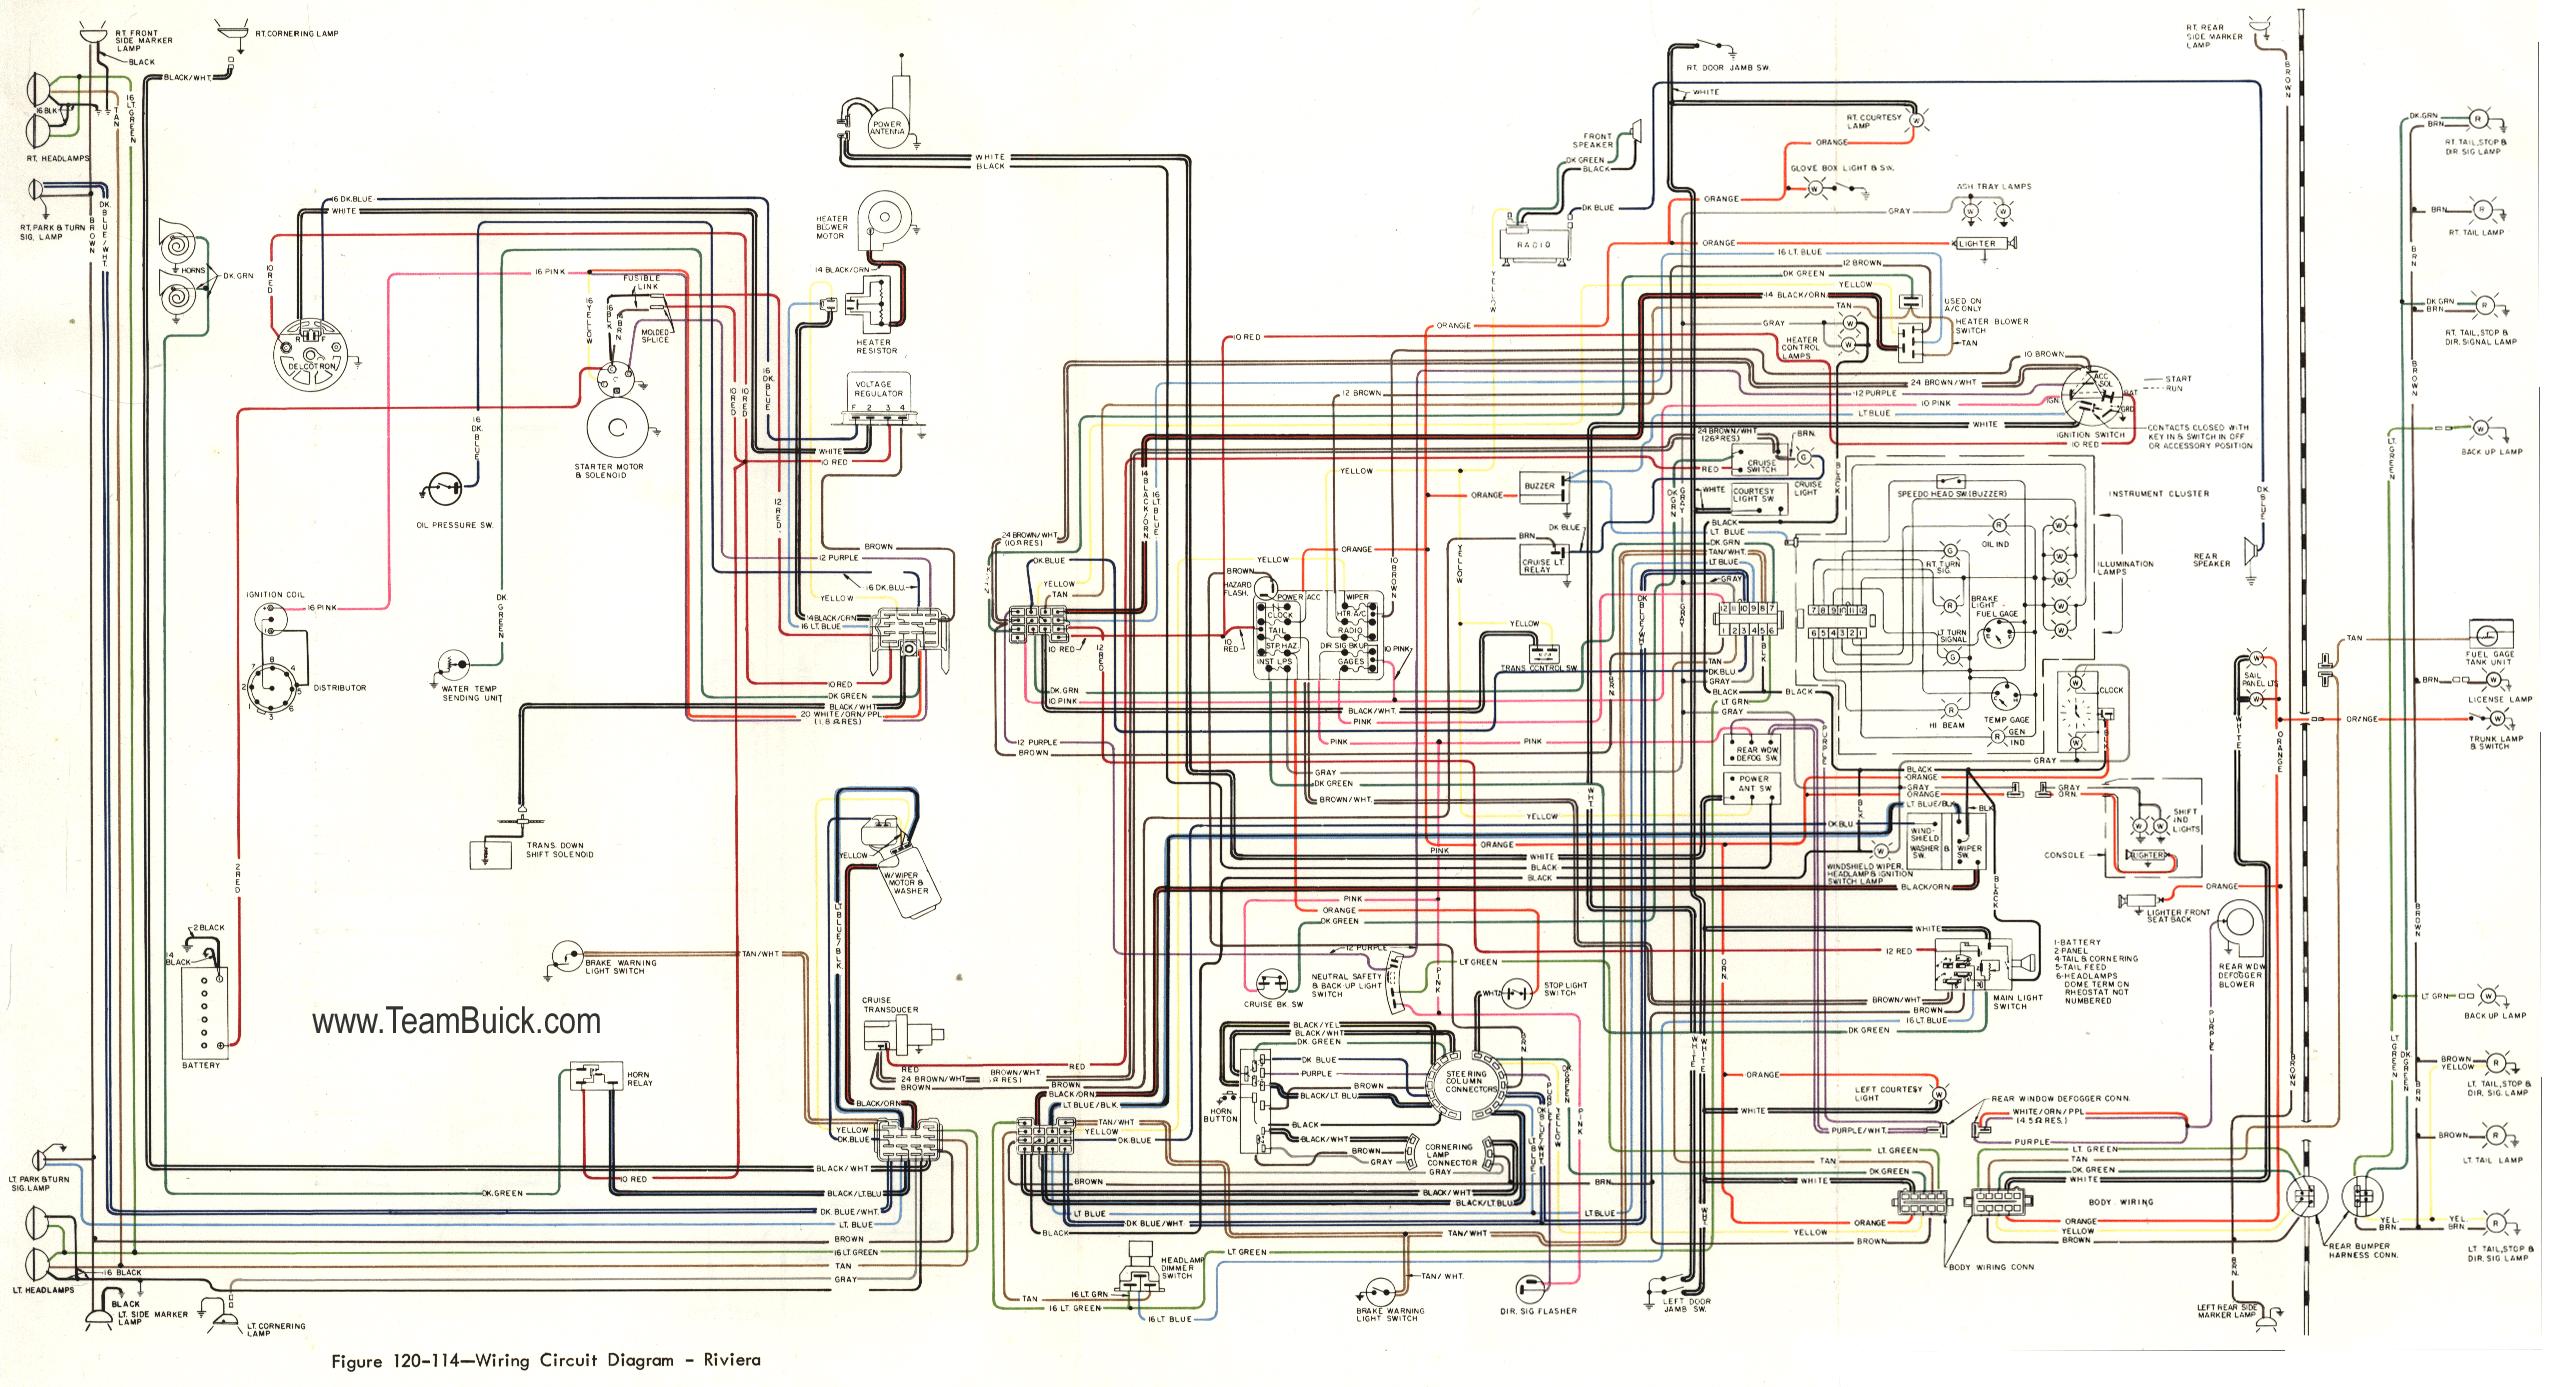 Br 6863 Buick Riviera Wiring Diagram Buick Lesabre Wiring Diagram 2002 Buick Download Diagram